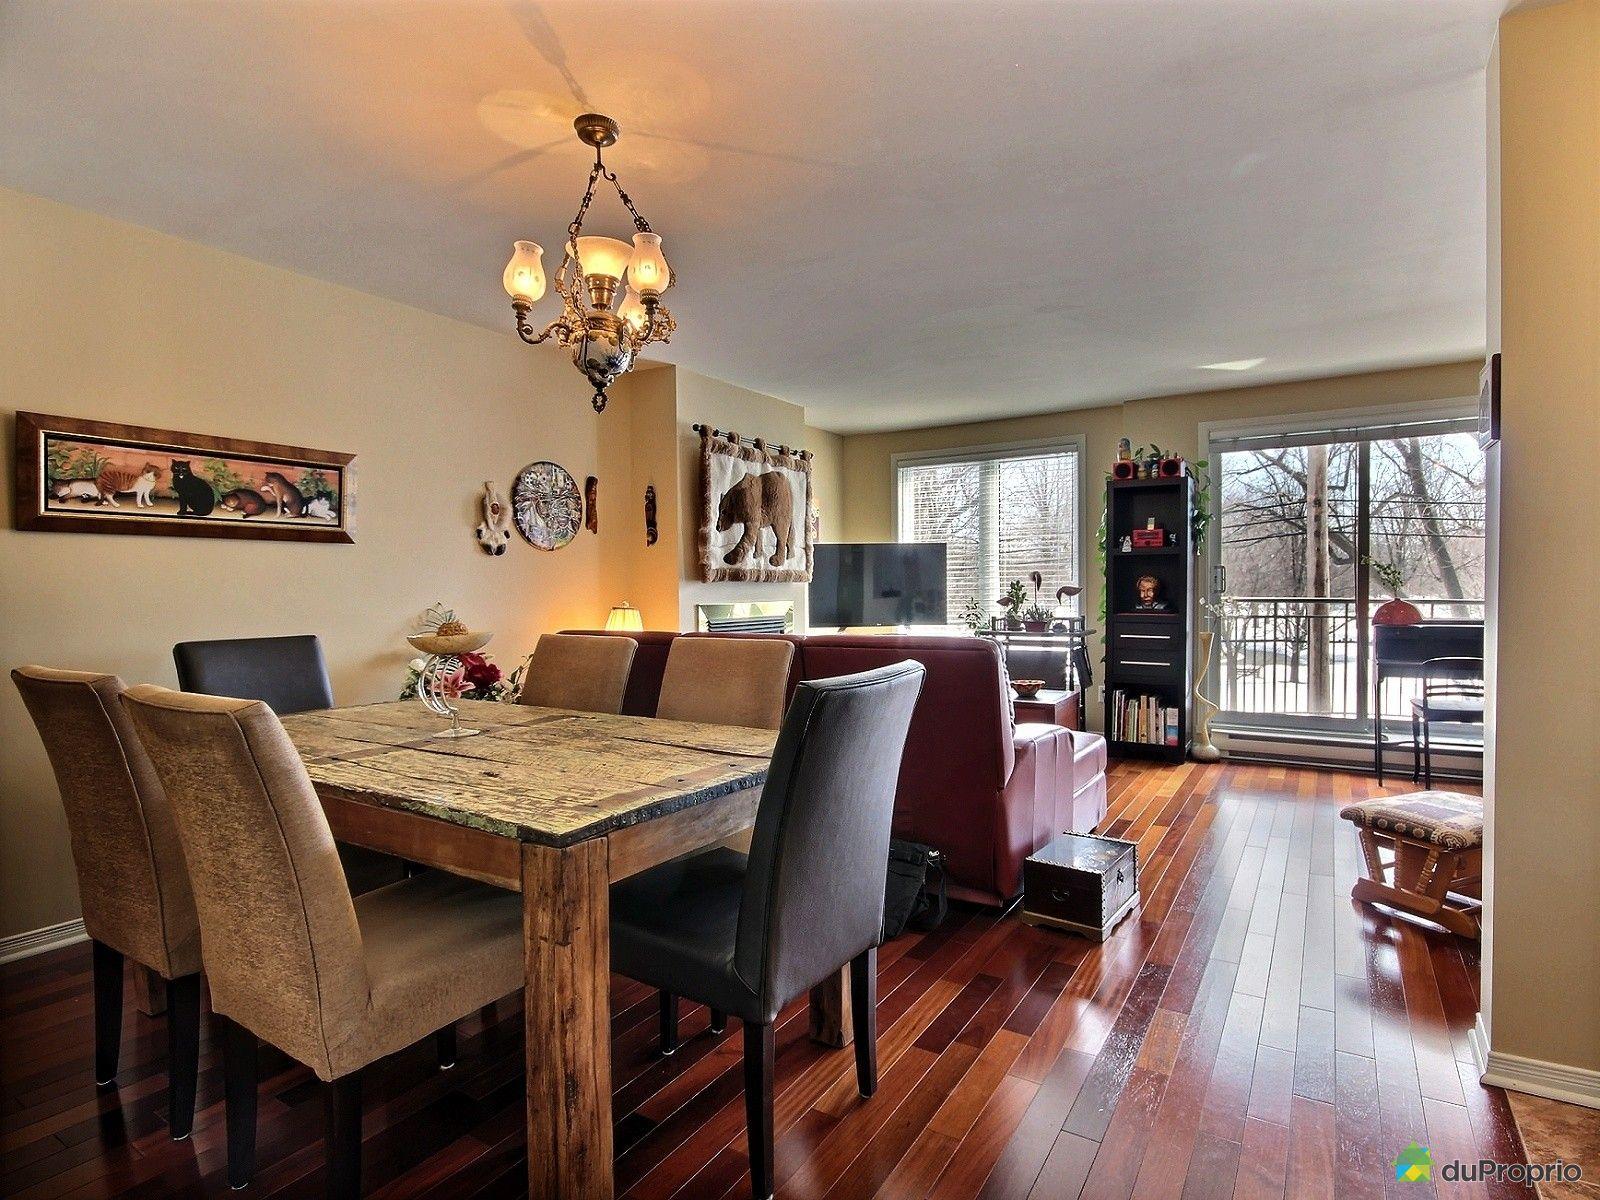 Dining Room / Living Room - 6-1260 rue Saint-Antoine, Lachine for sale